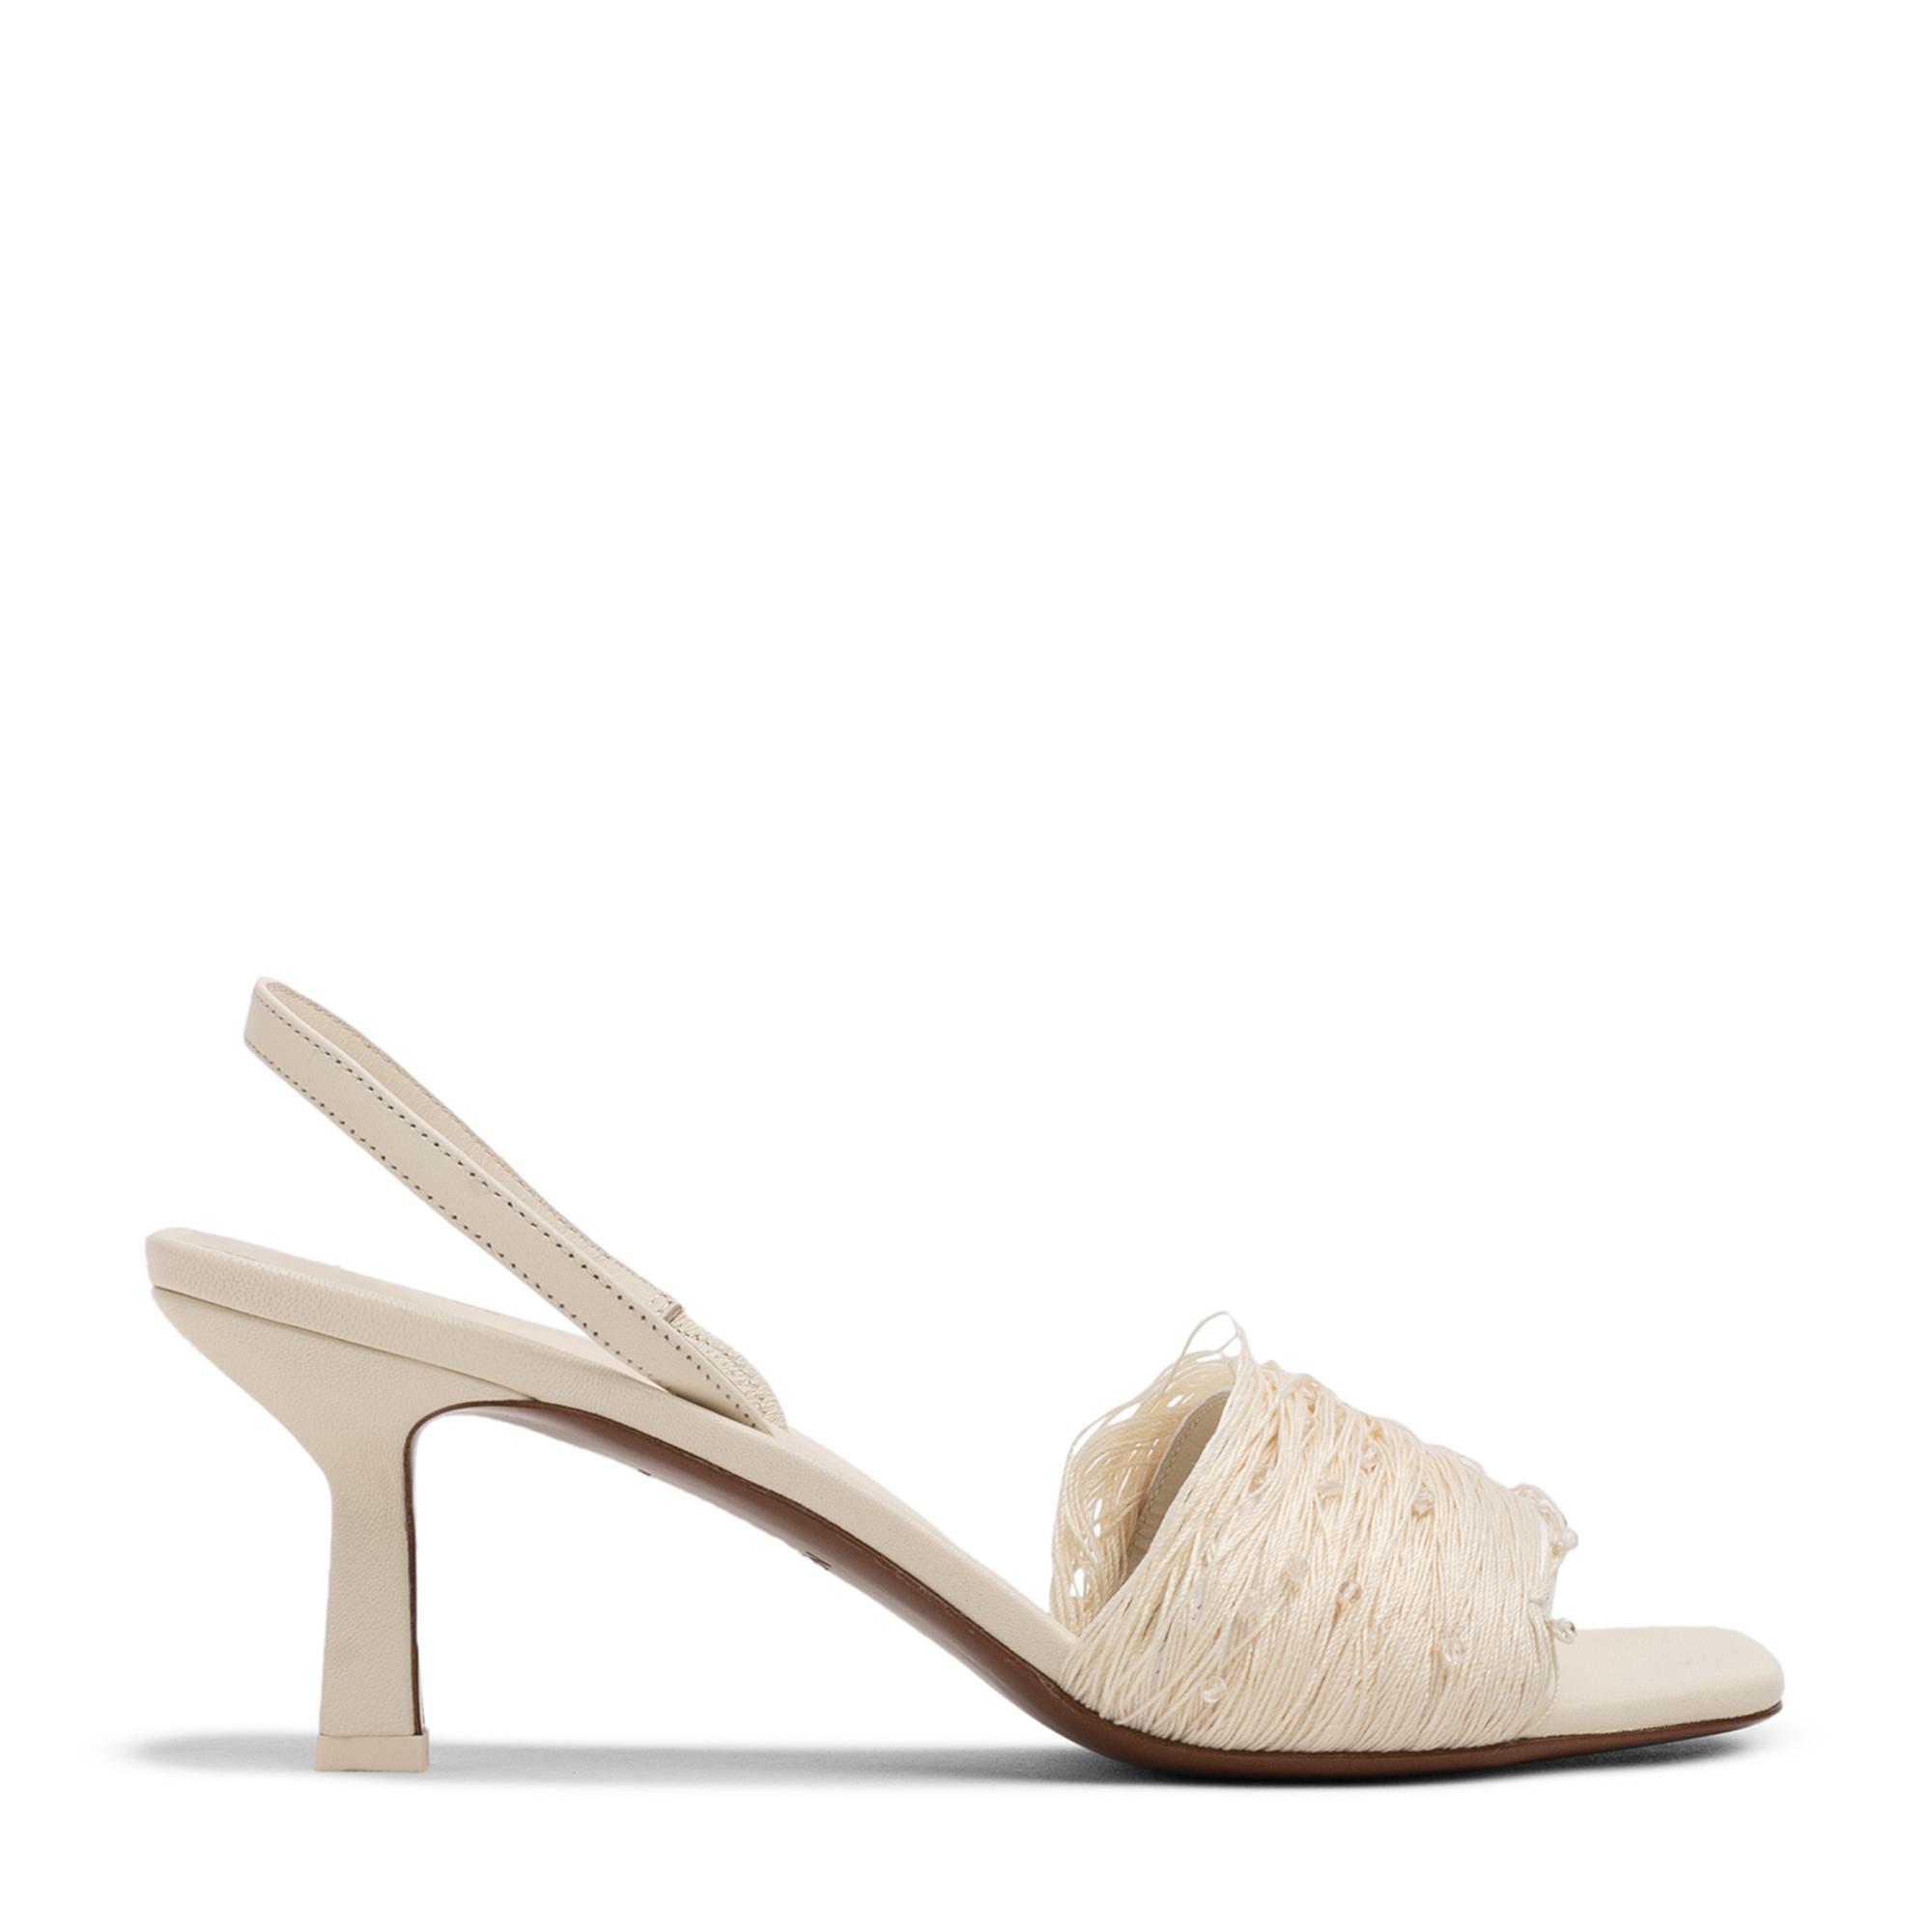 Syrma slingback sandals